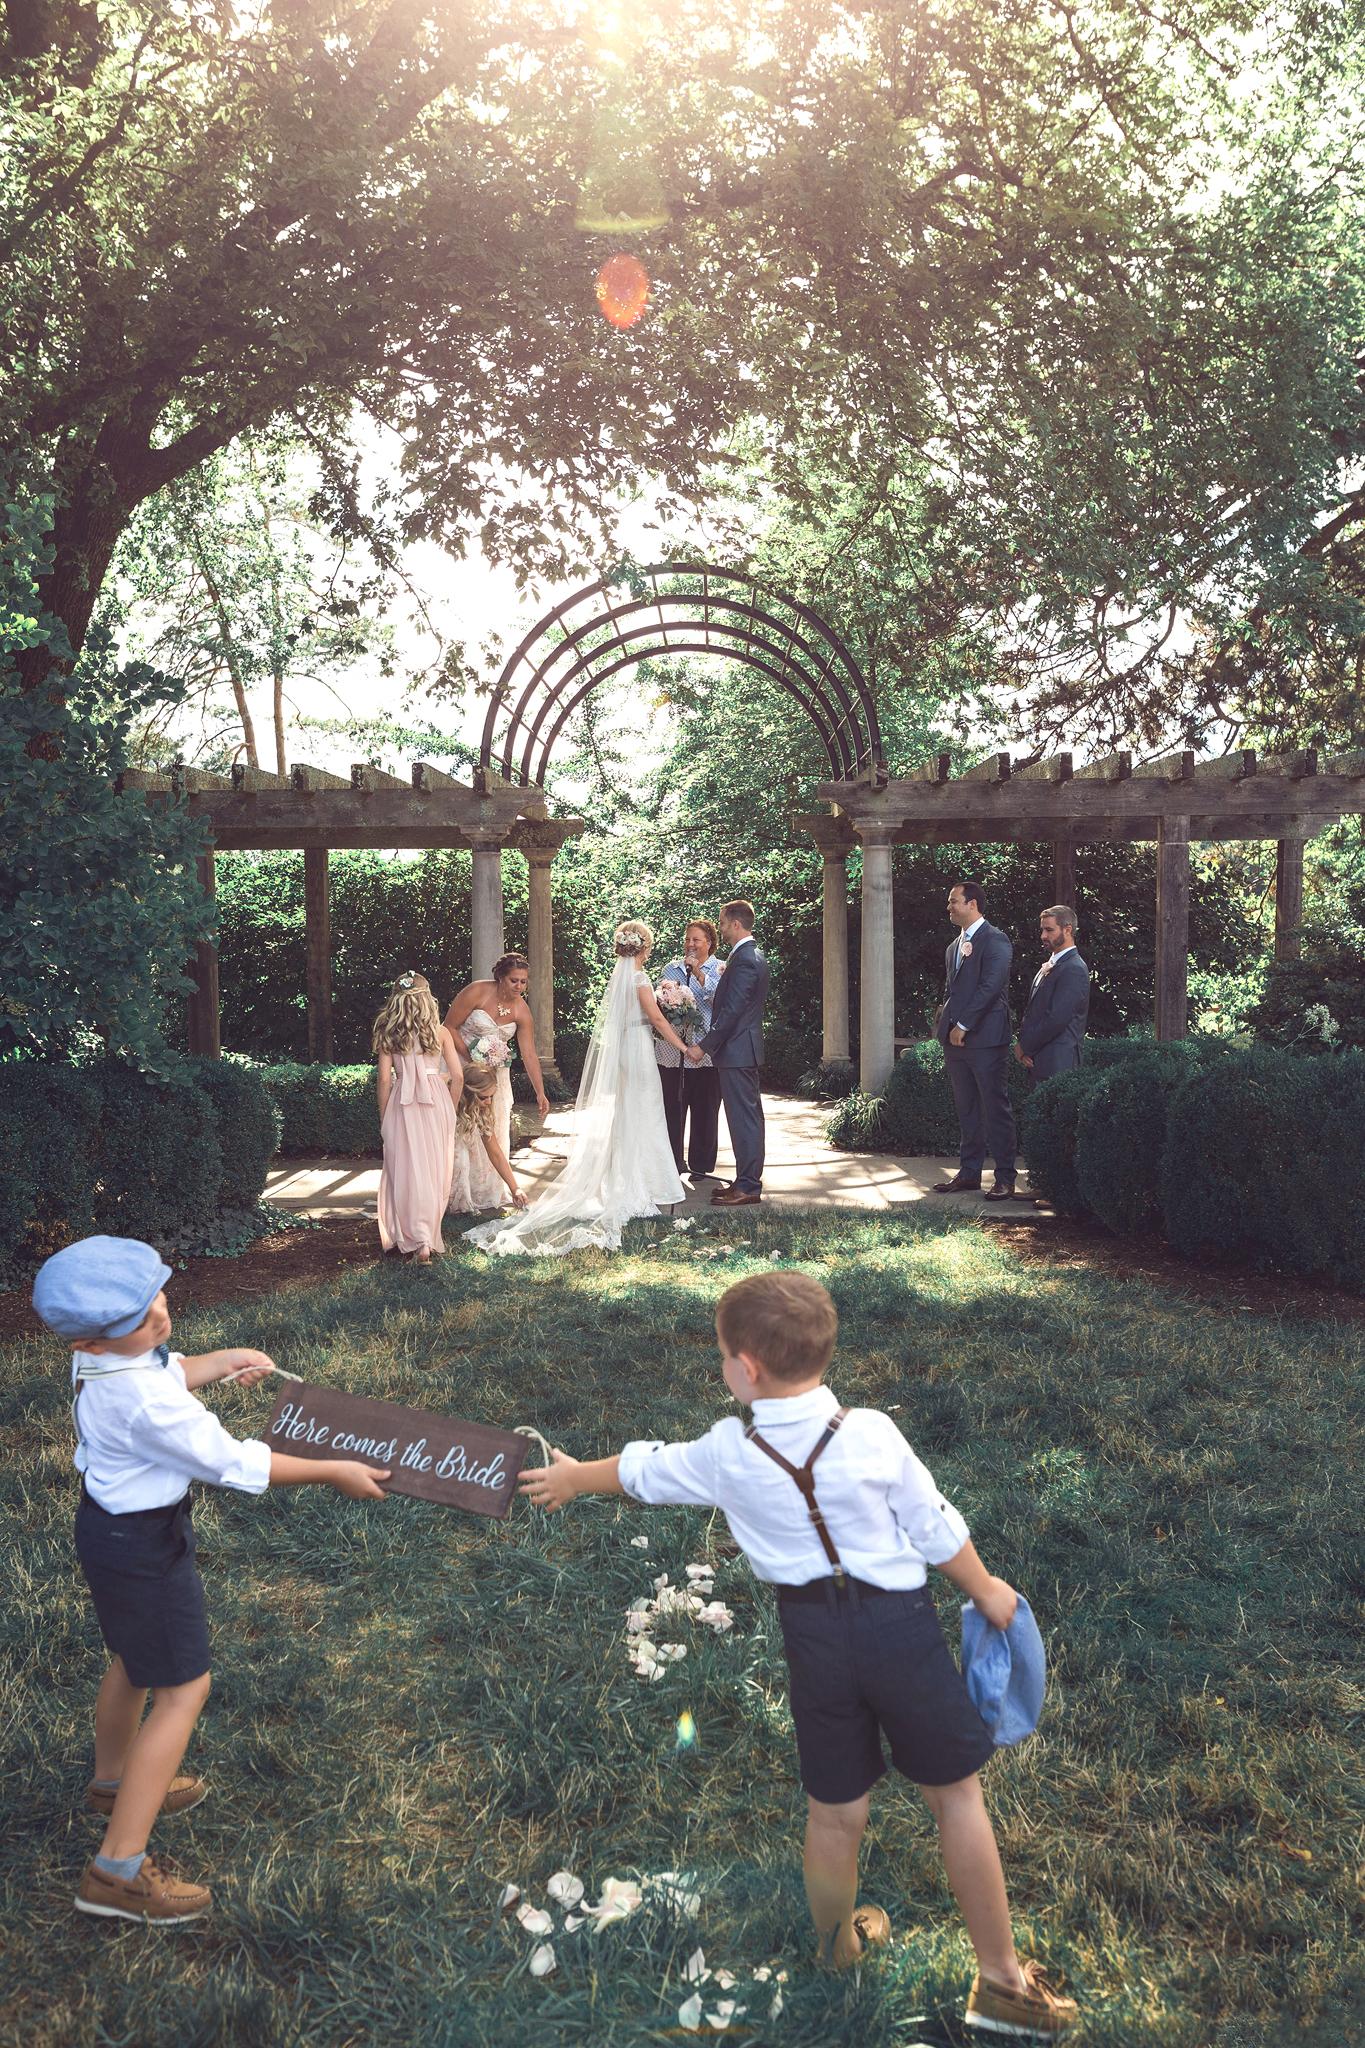 Cincinnati-Dayton-OH-Traveling-Wedding-Photographer-Rhinegeist-Brewery-Ault-Park-21C-96.jpg